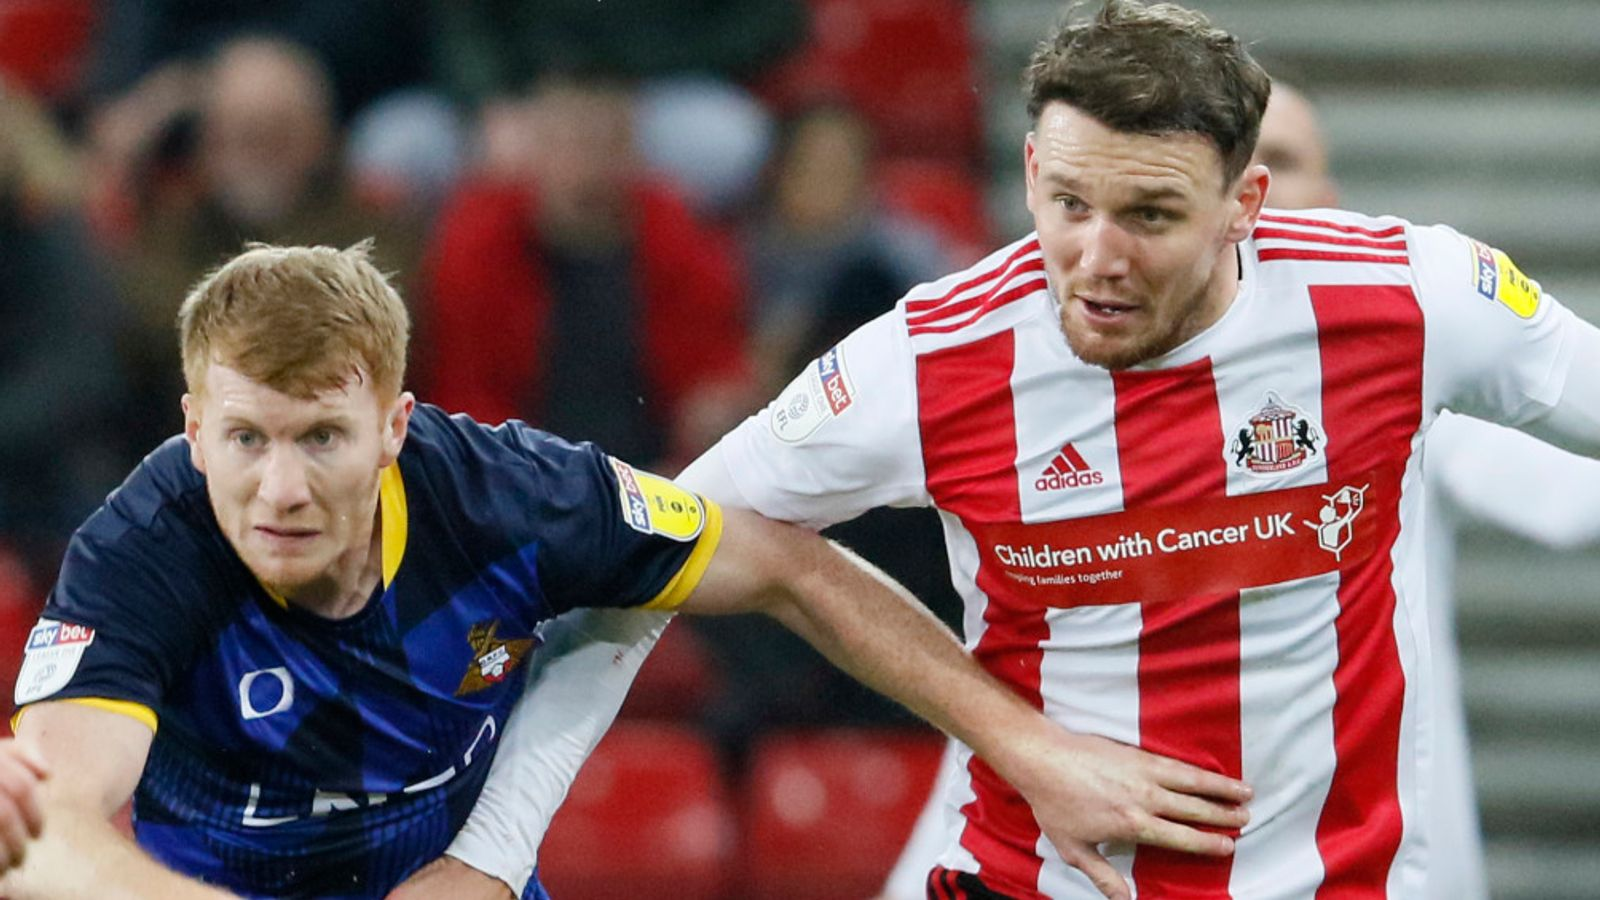 Sunderland 0-0 Doncaster: Stalemate at Stadium of Light